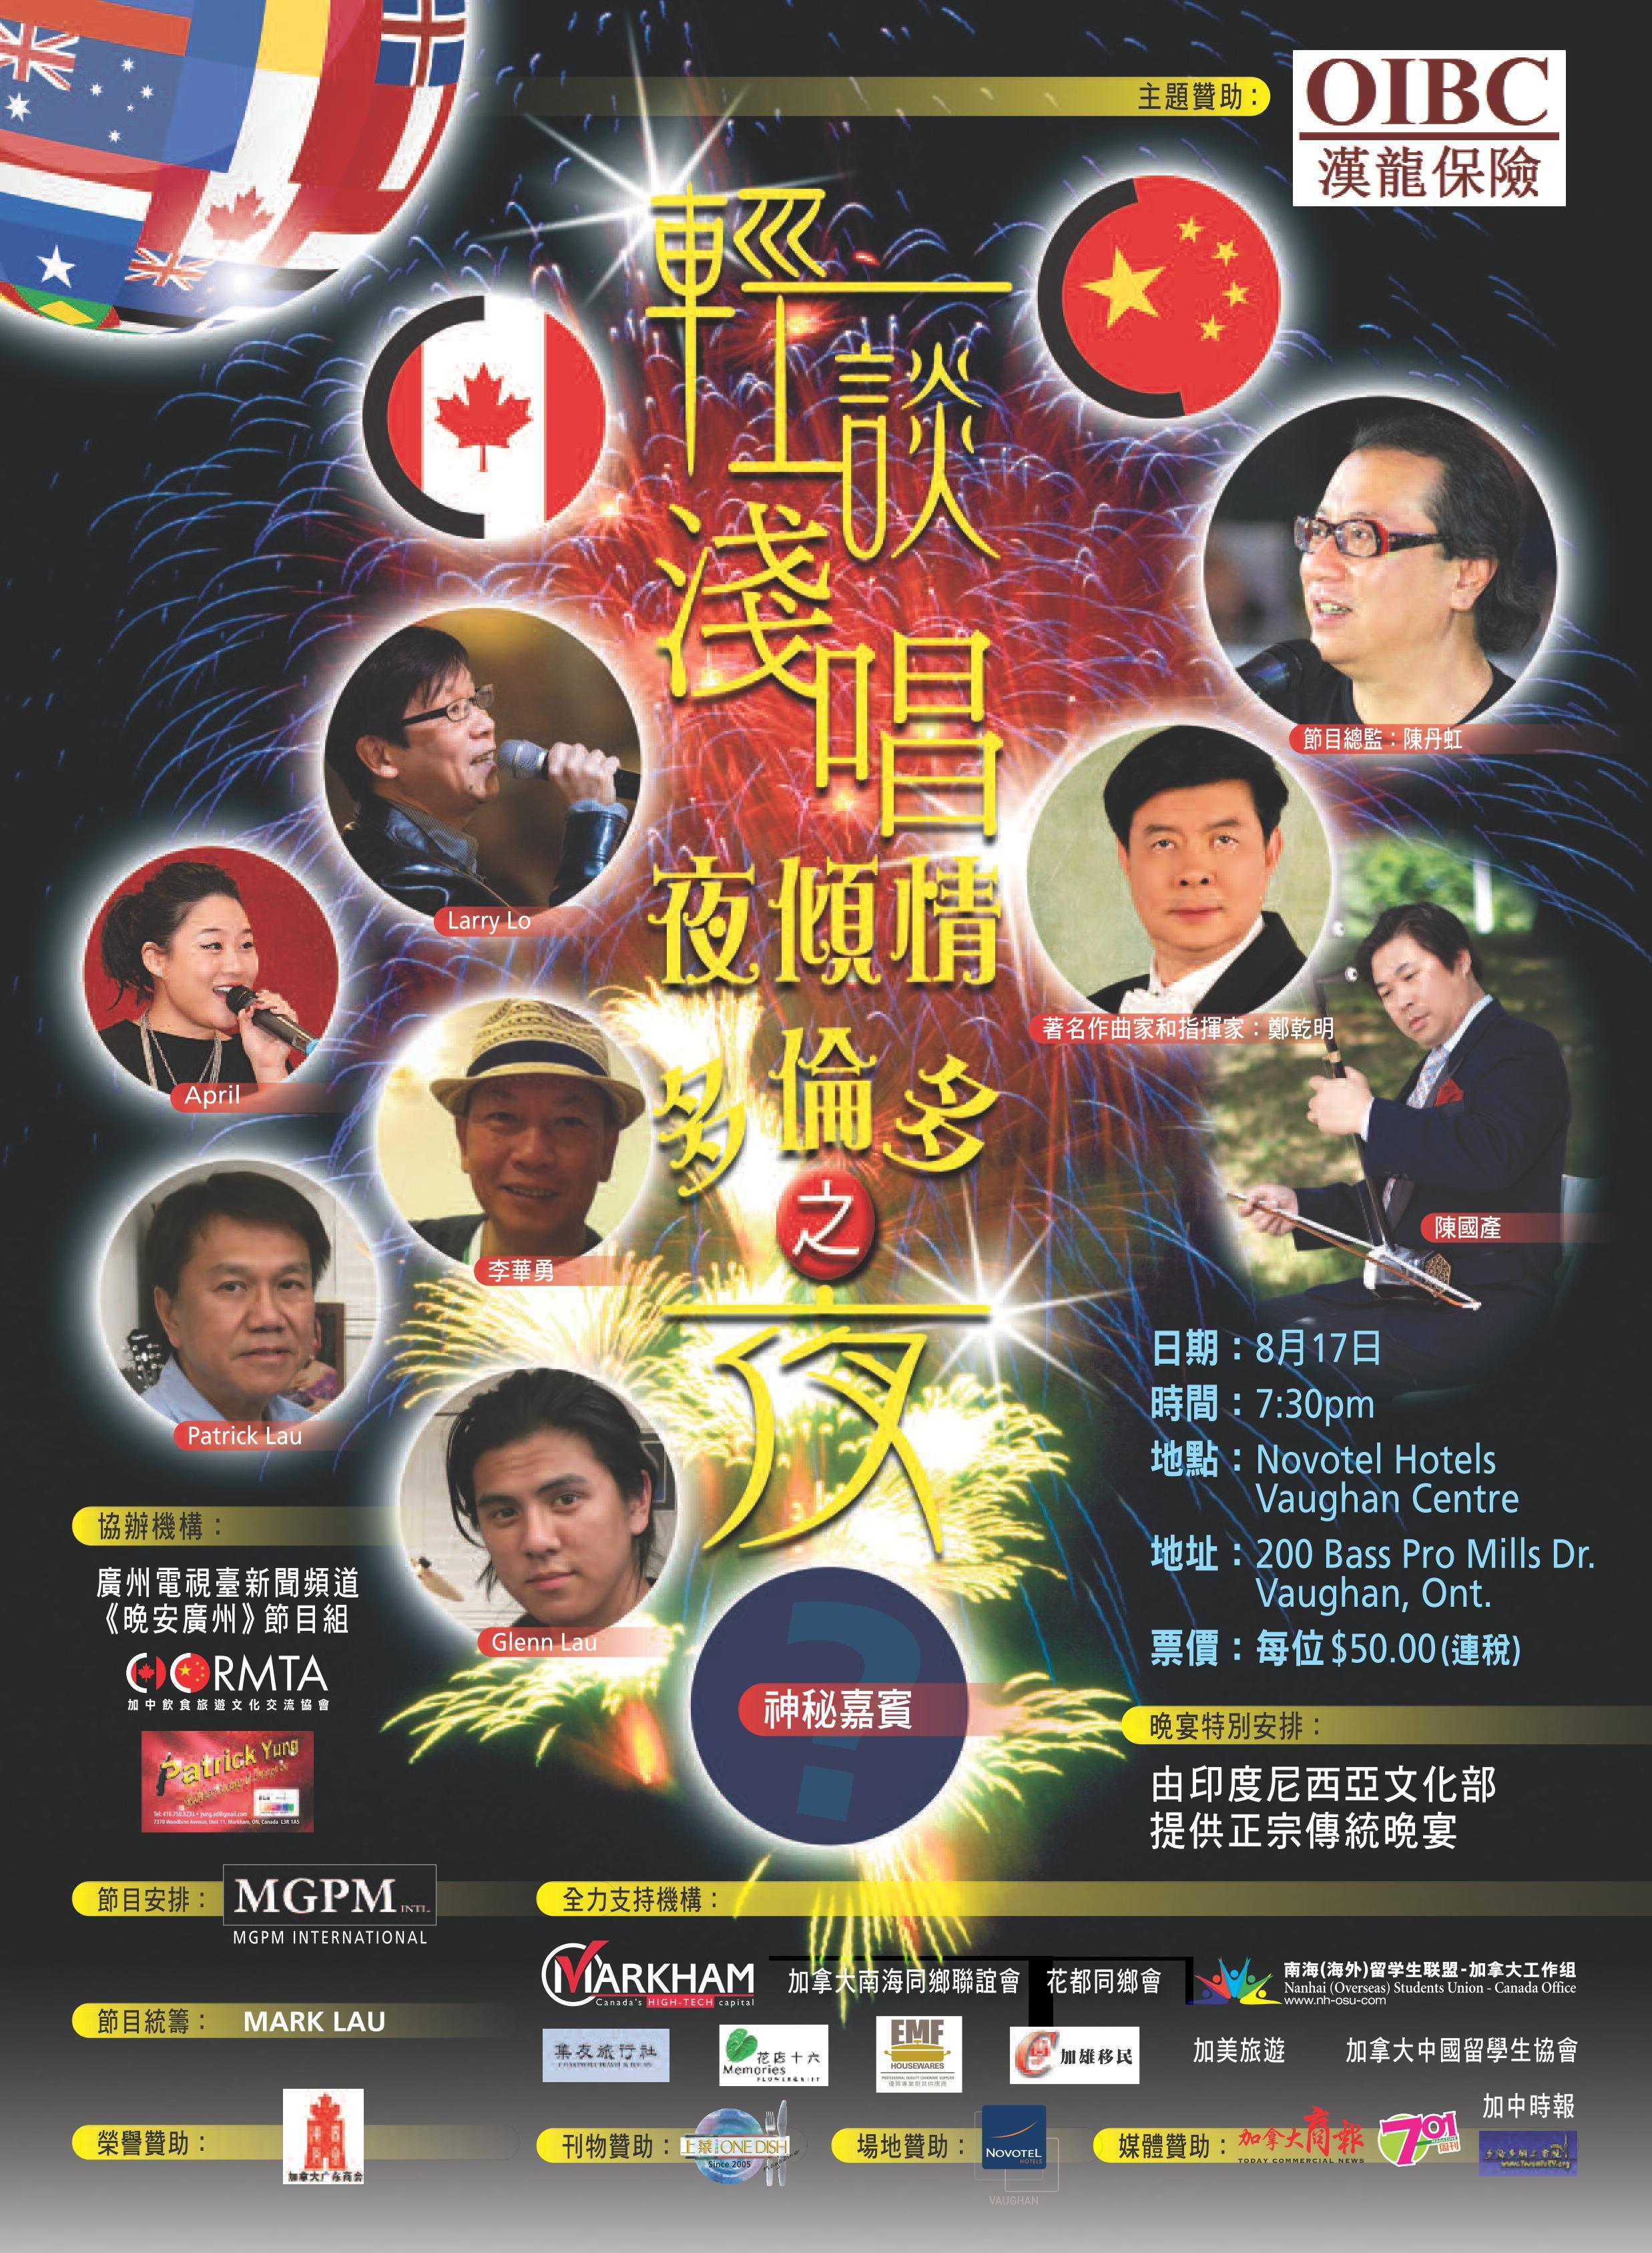 Concert 08 17 2013(1)_01.jpg